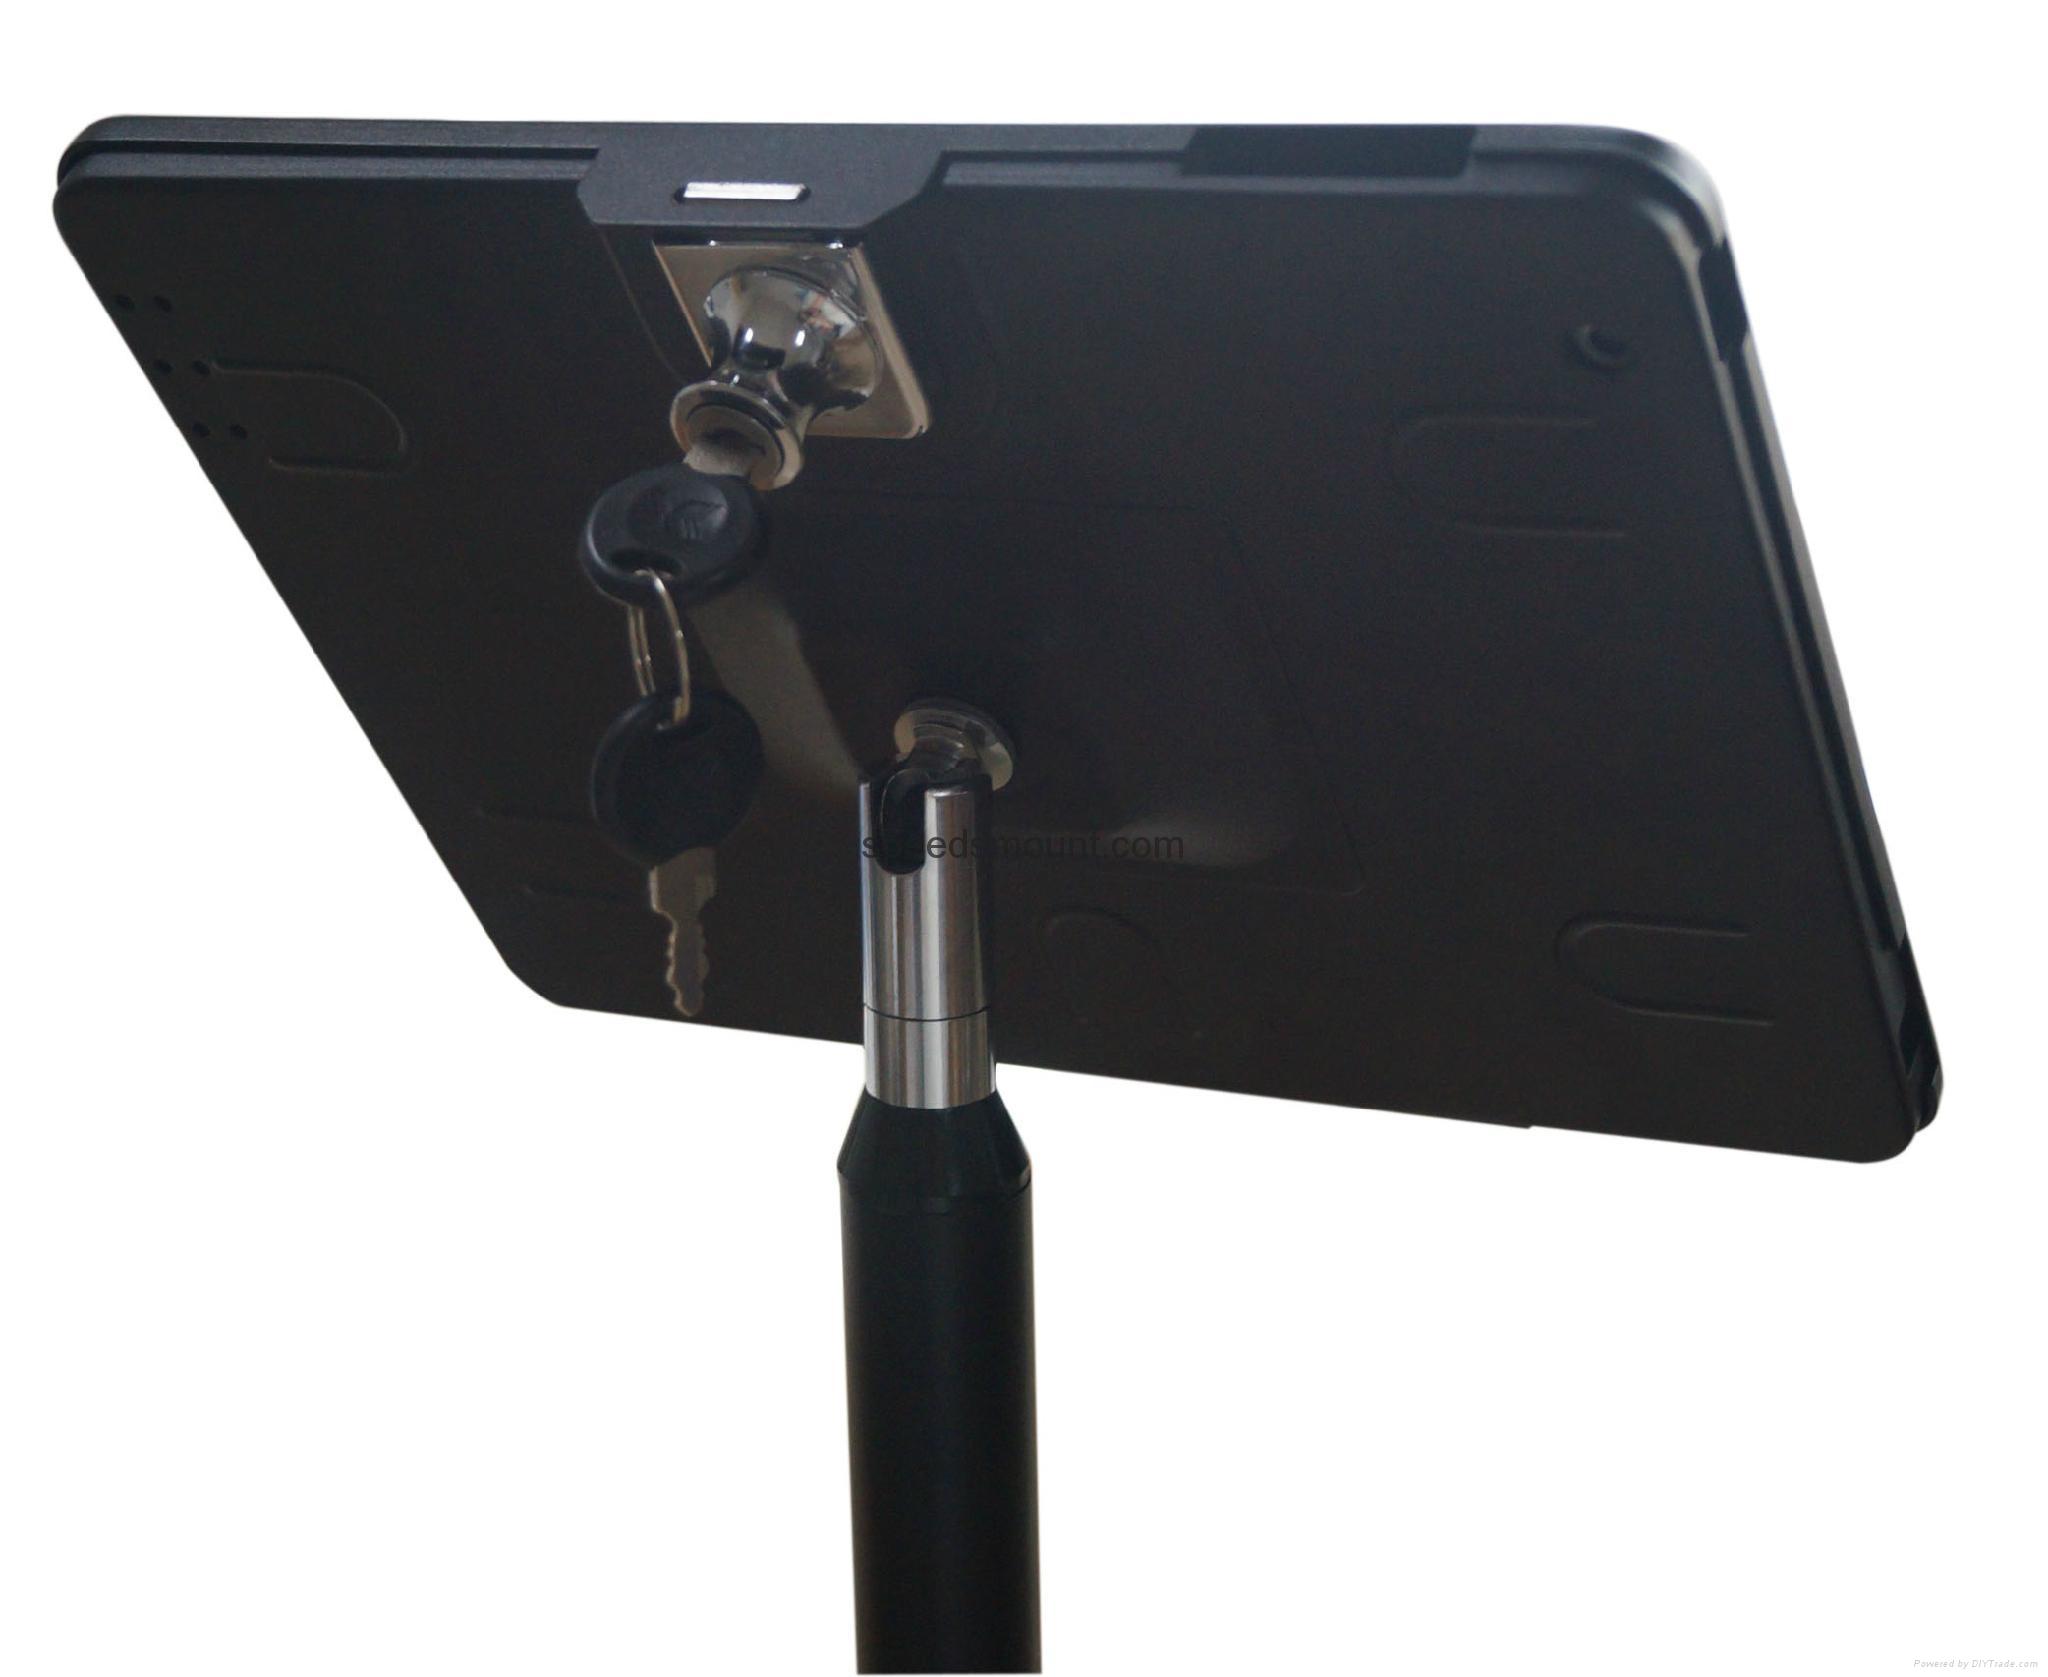 P25007 IPAD stand height adjustable whatsapp +65 84984312 singapore stock  5